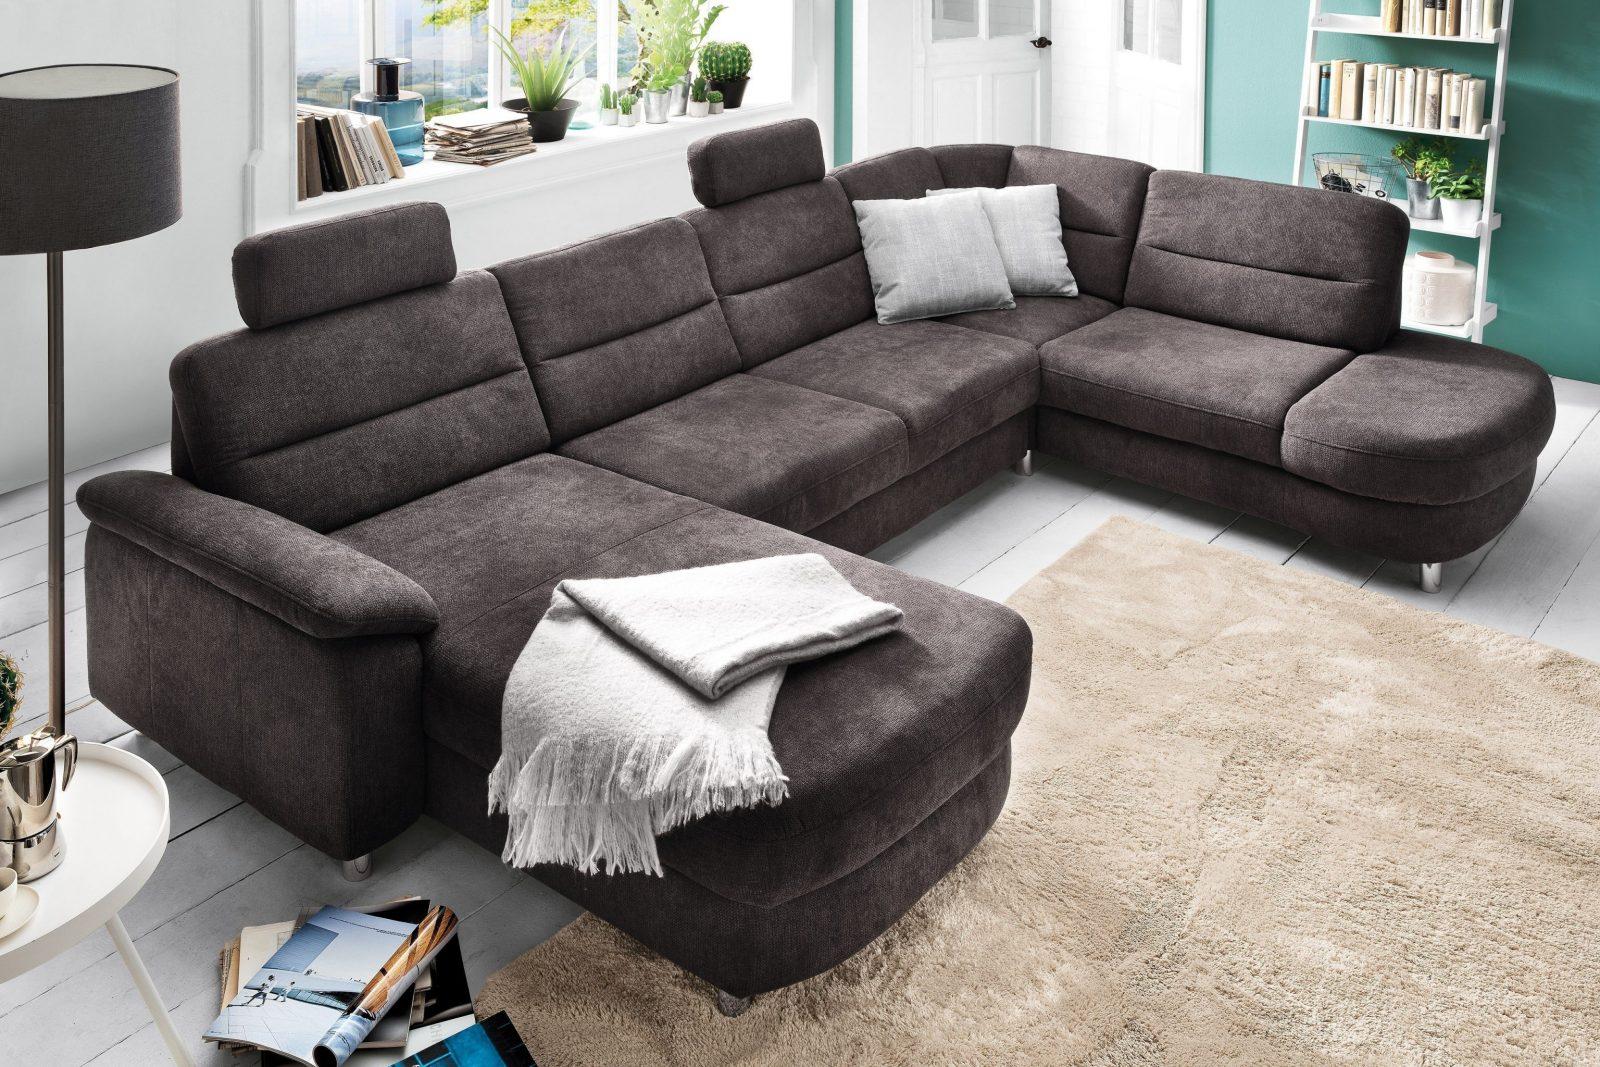 Sit  More Home Basic Delano Wohnlandschaft Grau  Möbel Letz  Ihr von Wohnlandschaft Sit & More Bild